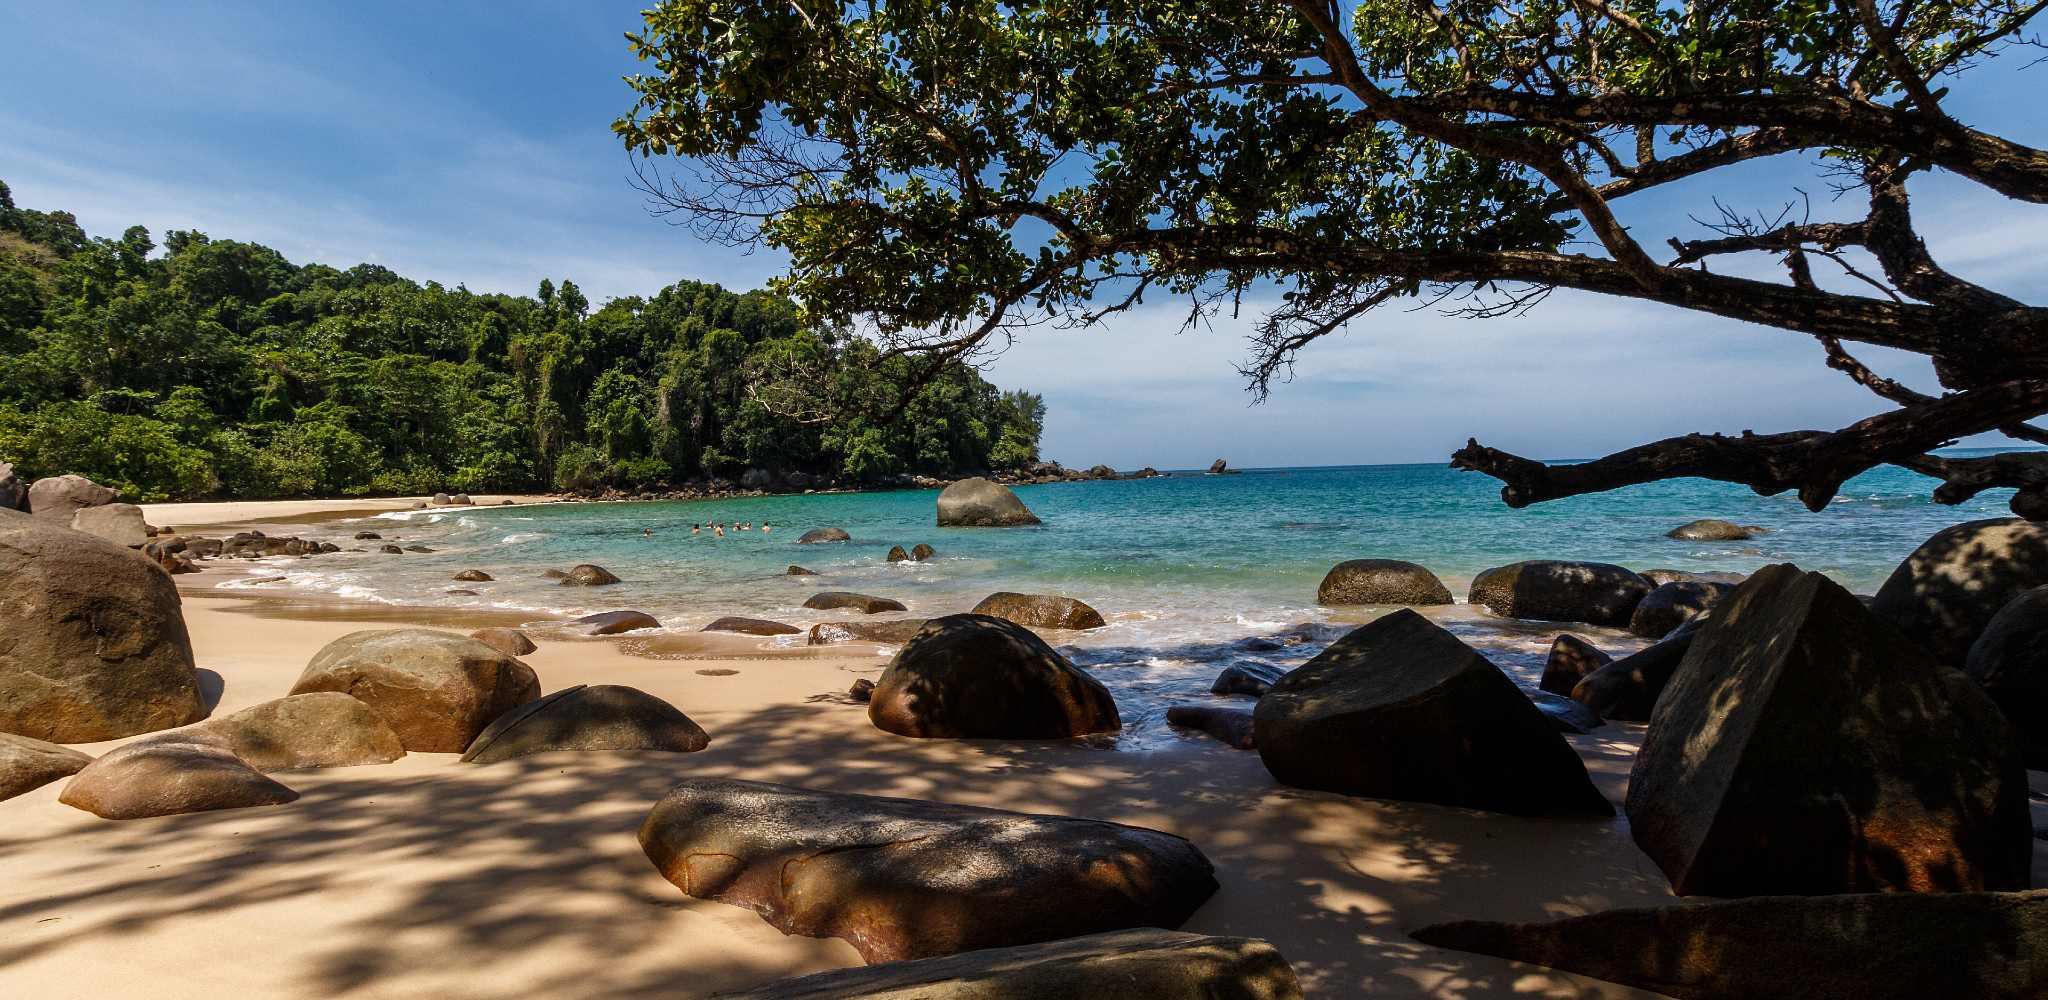 Small Sandy Beach een klein strandje in het Lam Ru National Park, Khao Lak